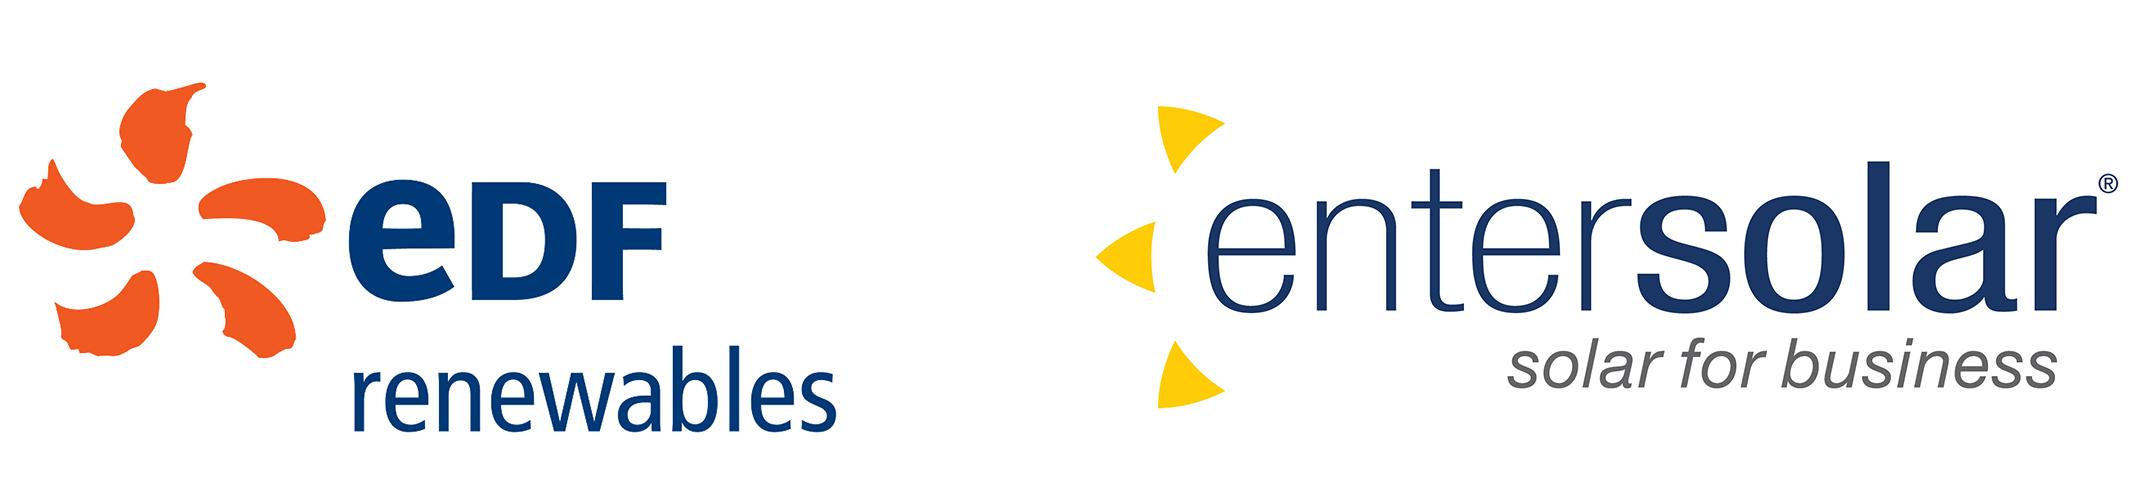 edf-entersolar-banner-LRG.png